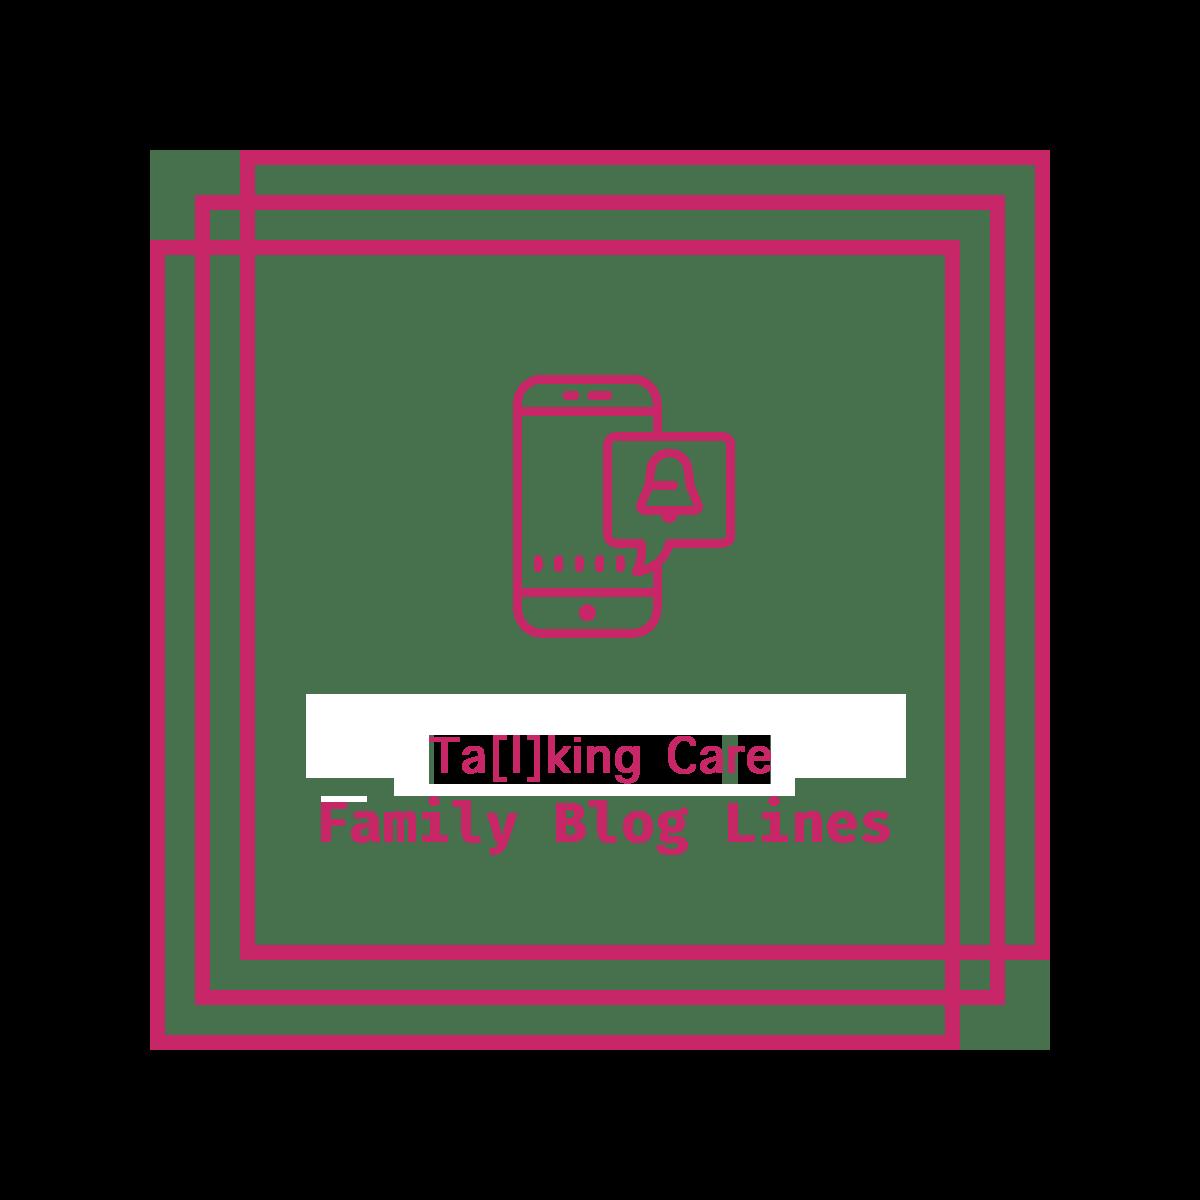 Ta[l]king Care: Family Blog Lines